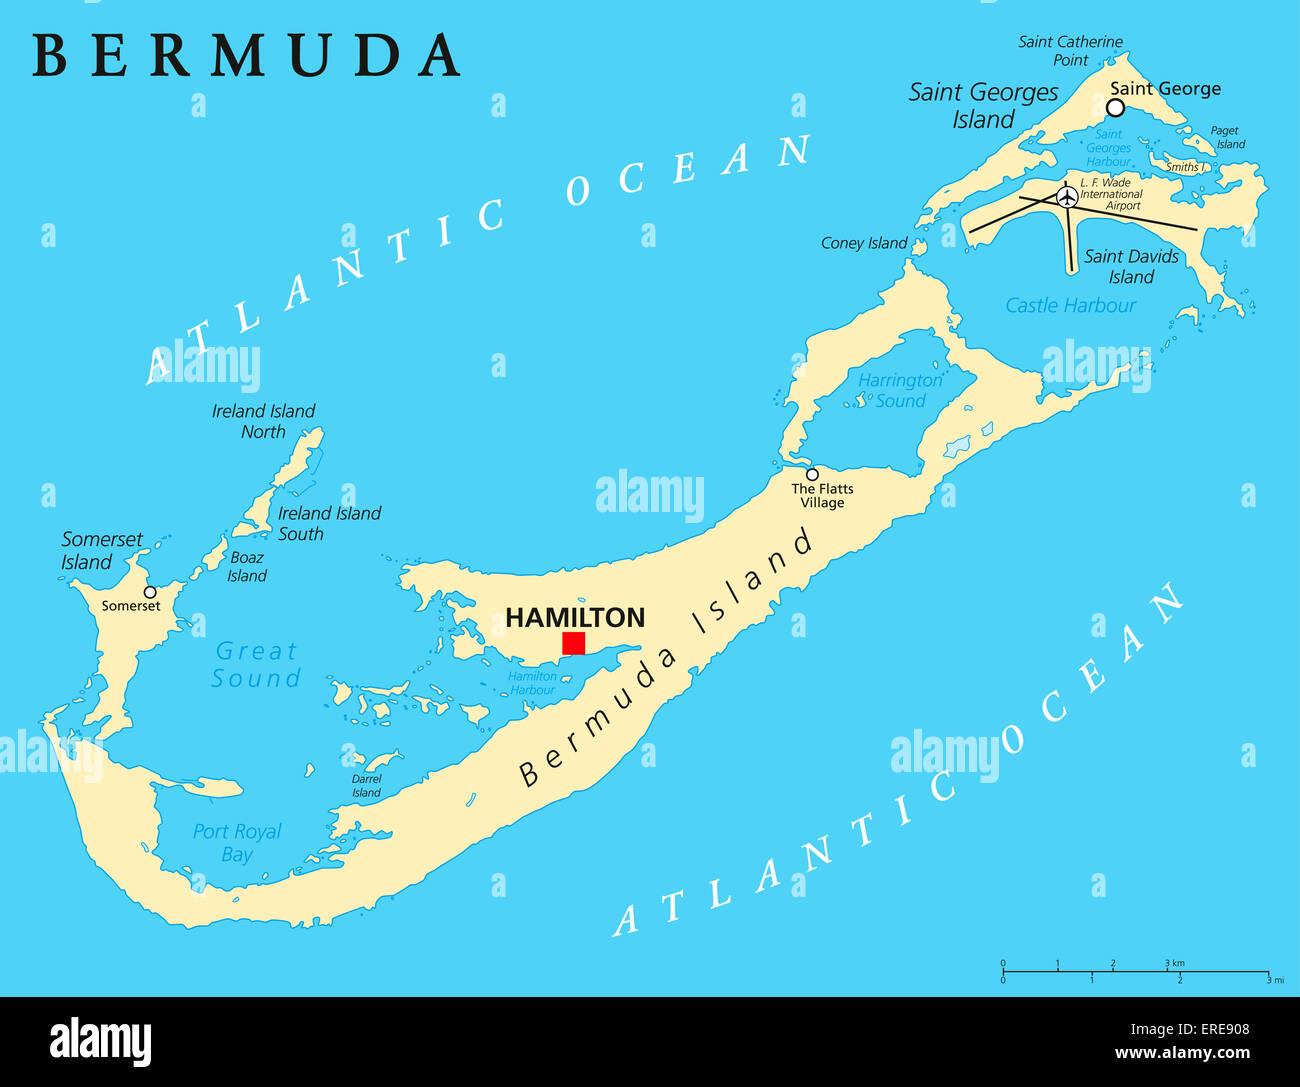 Bermuda Political Map Stock Photo: 83292952 - Alamy on south america map, italy map, sudan map, cook islands map, atlantic ocean map, greenland map, ethiopia map, egypt map, angola map, rwanda map, western hemisphere map, algeria map, mozambique map, malawi map, lesotho map, niger map, namibia map, turks and caicos map, morocco map, senegal map, jamaica map, eritrea map, puerto rico map, caribbean map, libya map, madagascar map, brunei map, gibraltar map, mediterranean map, monaco map, ghana map, kenya map, virgin islands map, tunisia map, st. martin map, west indies map, central america map, north america map, zimbabwe map, navassa island map,